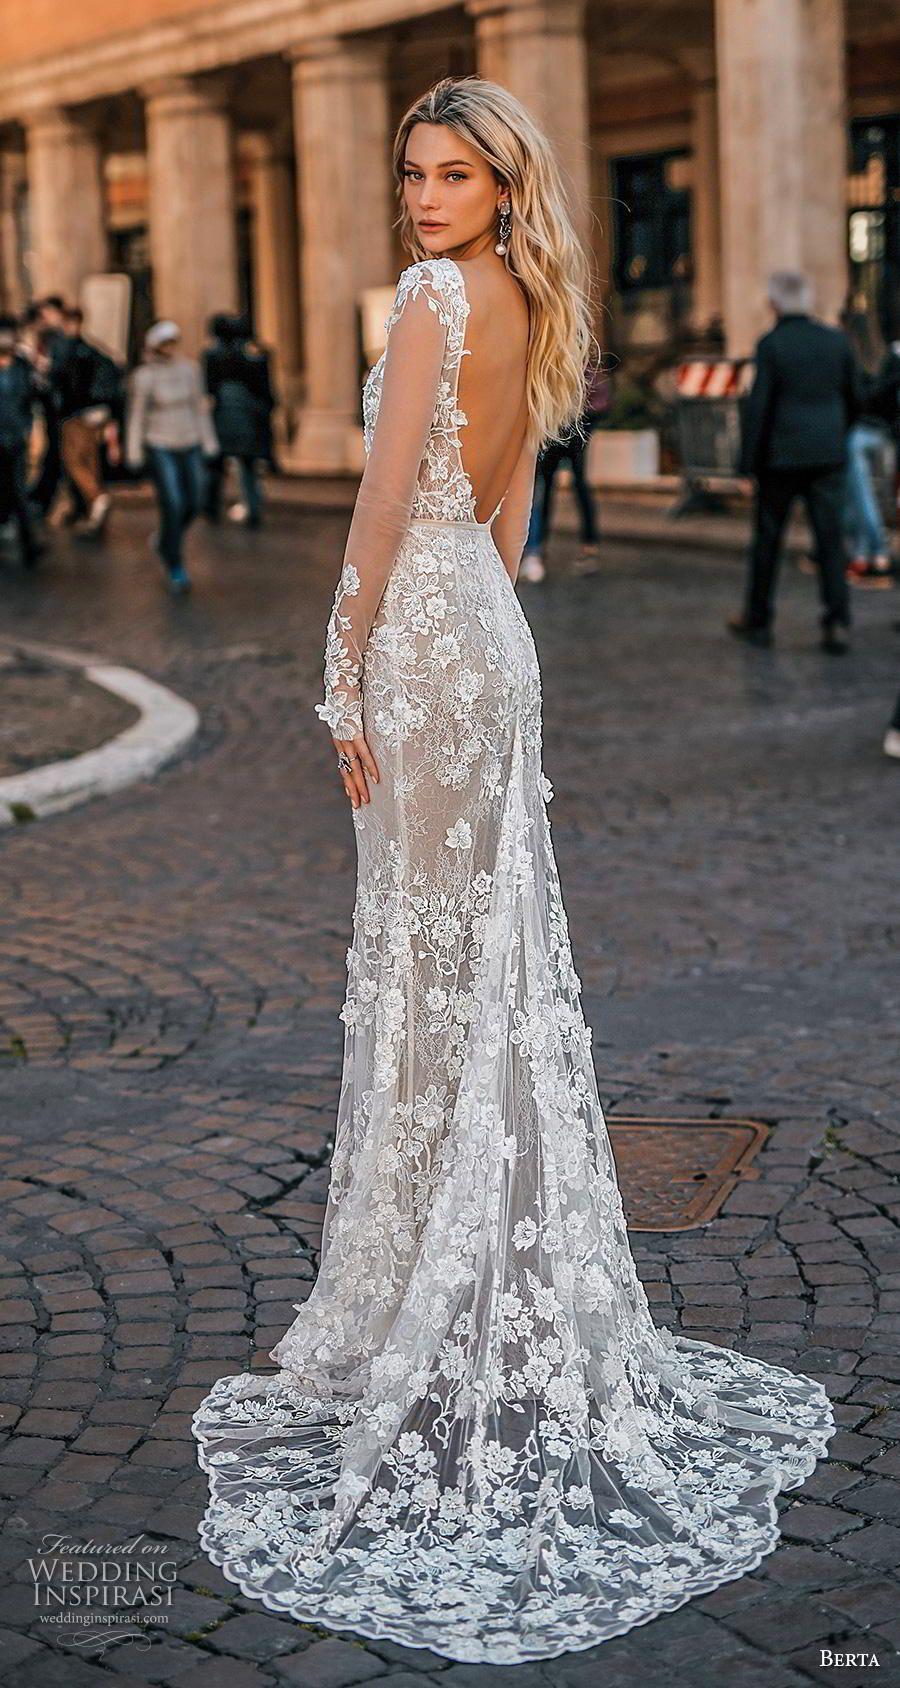 Berta Privee No 2 Wedding Dresses 2020 Bridal Collection Wedding Inspirasi Long Sleeve Bridal Gown Wedding Dress Sleeves Fitted Wedding Dress [ 1688 x 900 Pixel ]